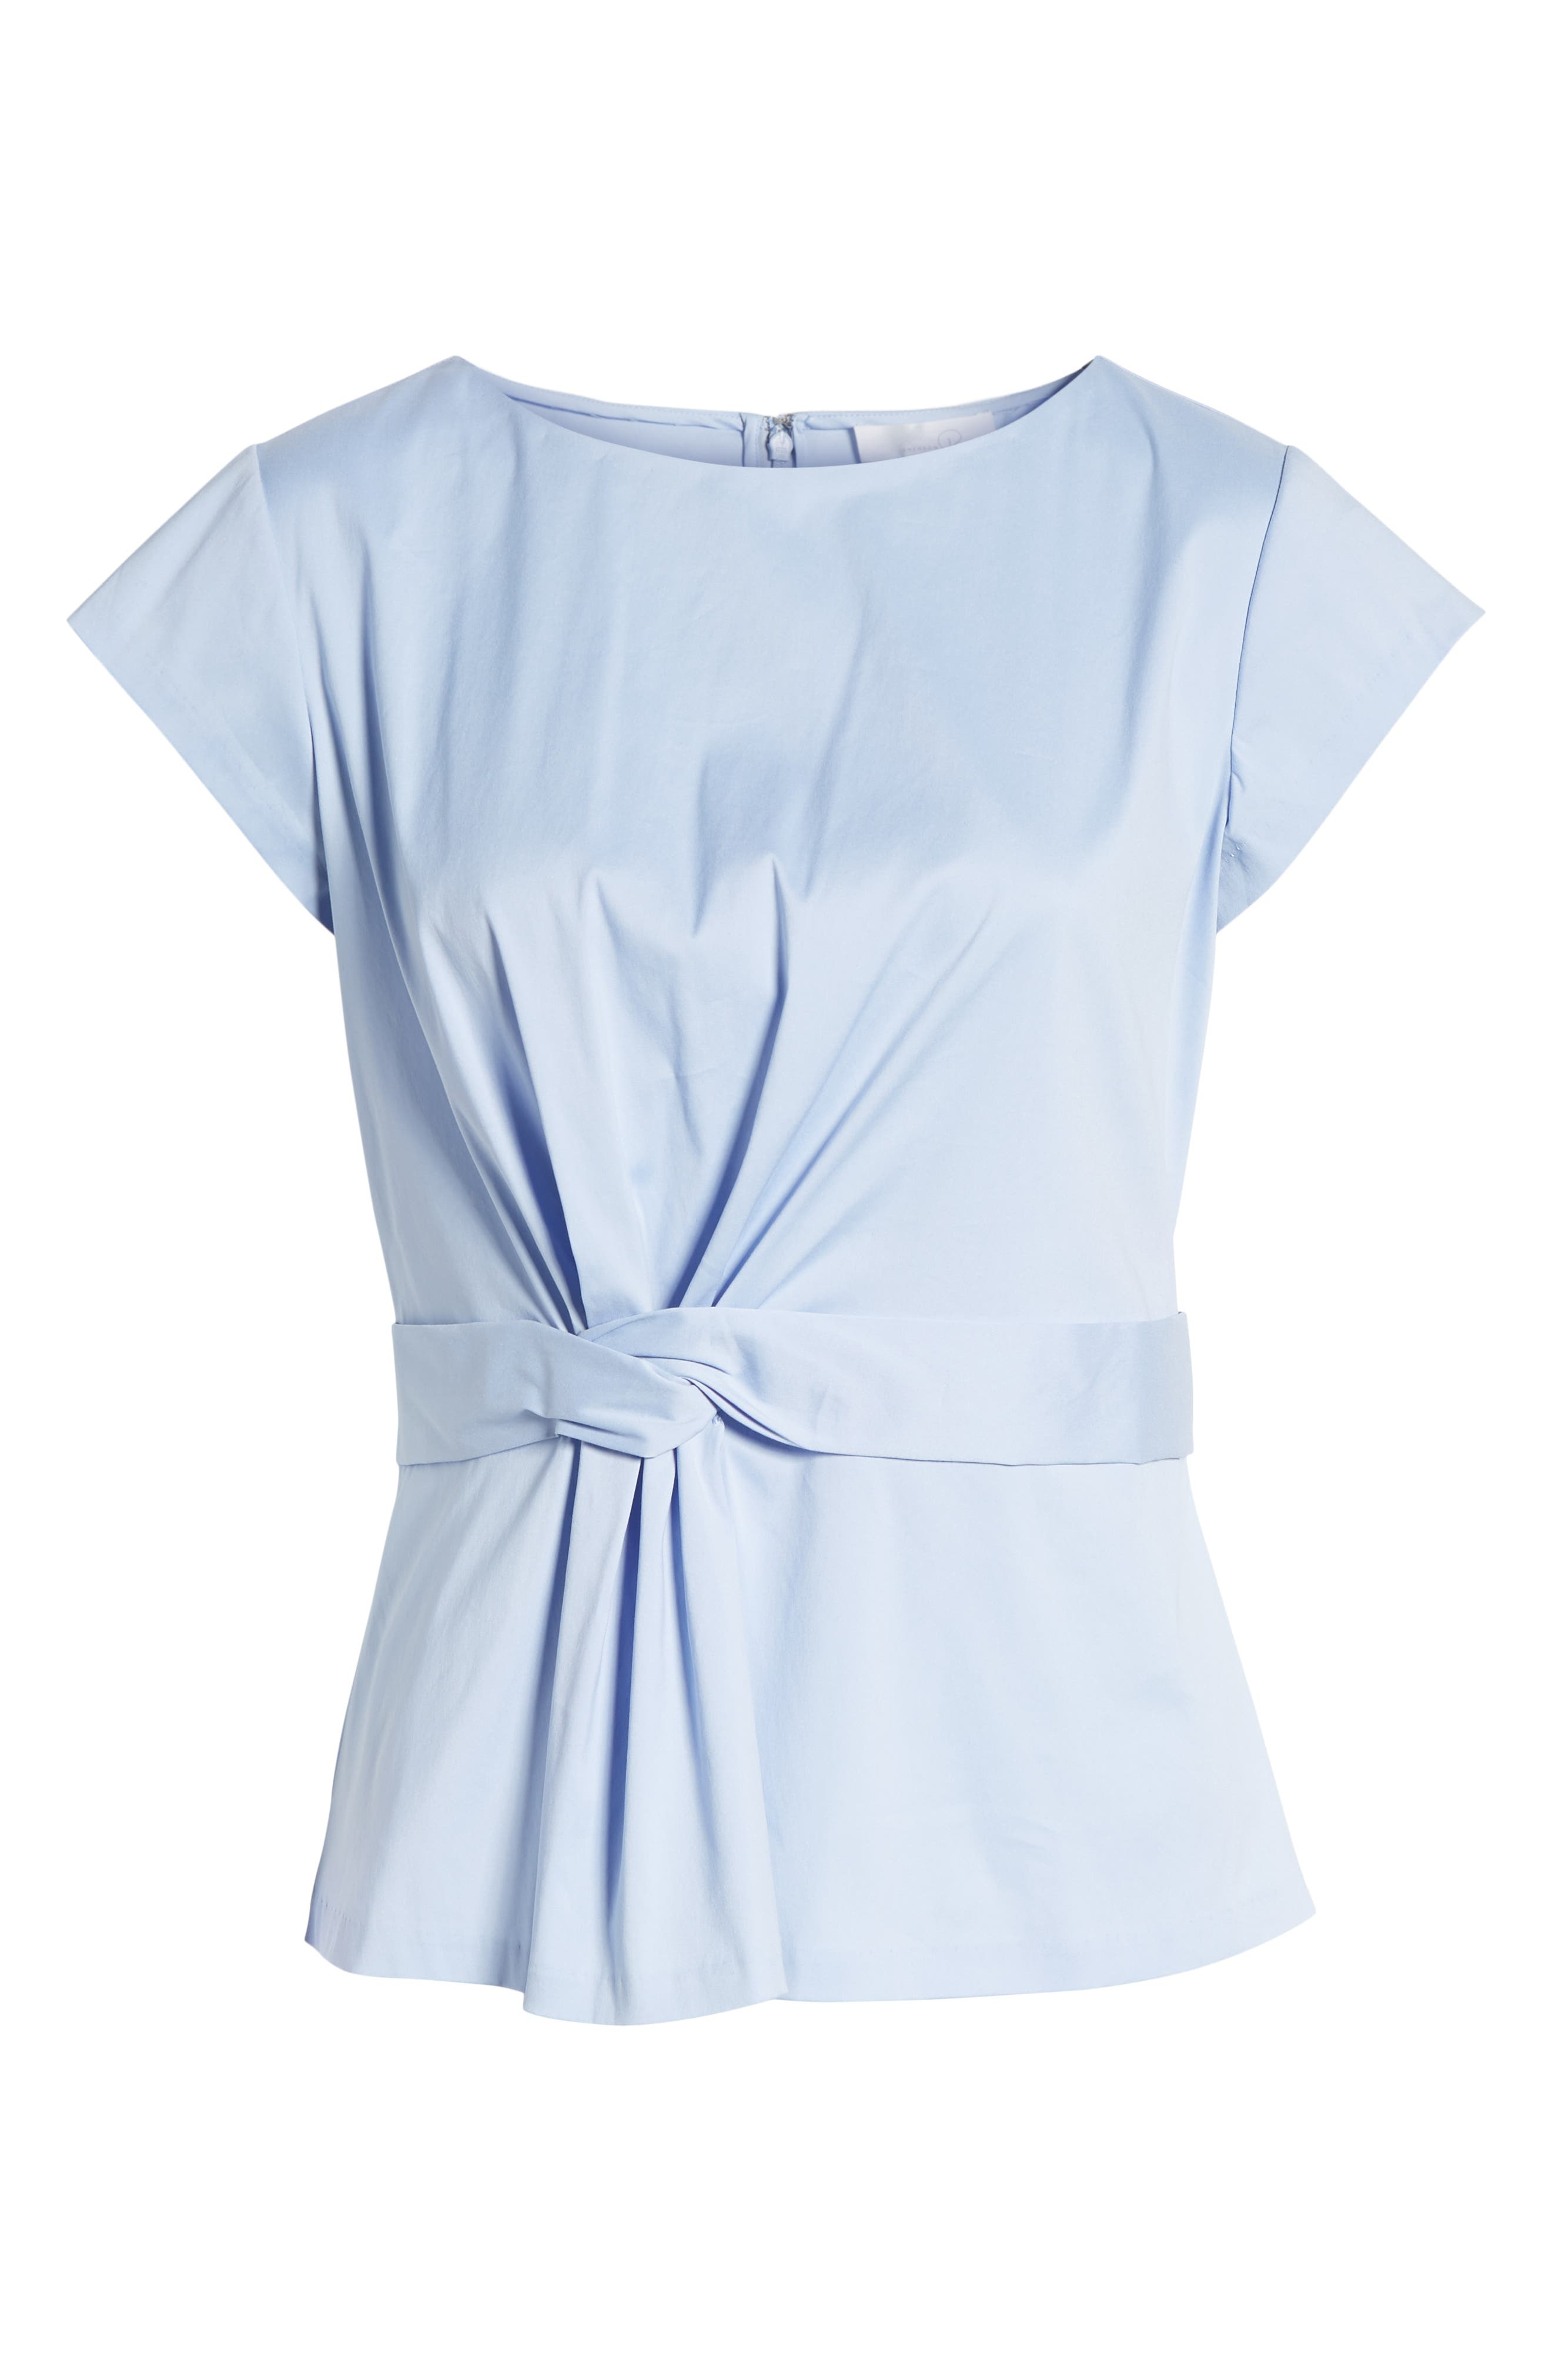 Knot Front Cotton Blend Poplin Blouse,                             Alternate thumbnail 6, color,                             Blue Stork